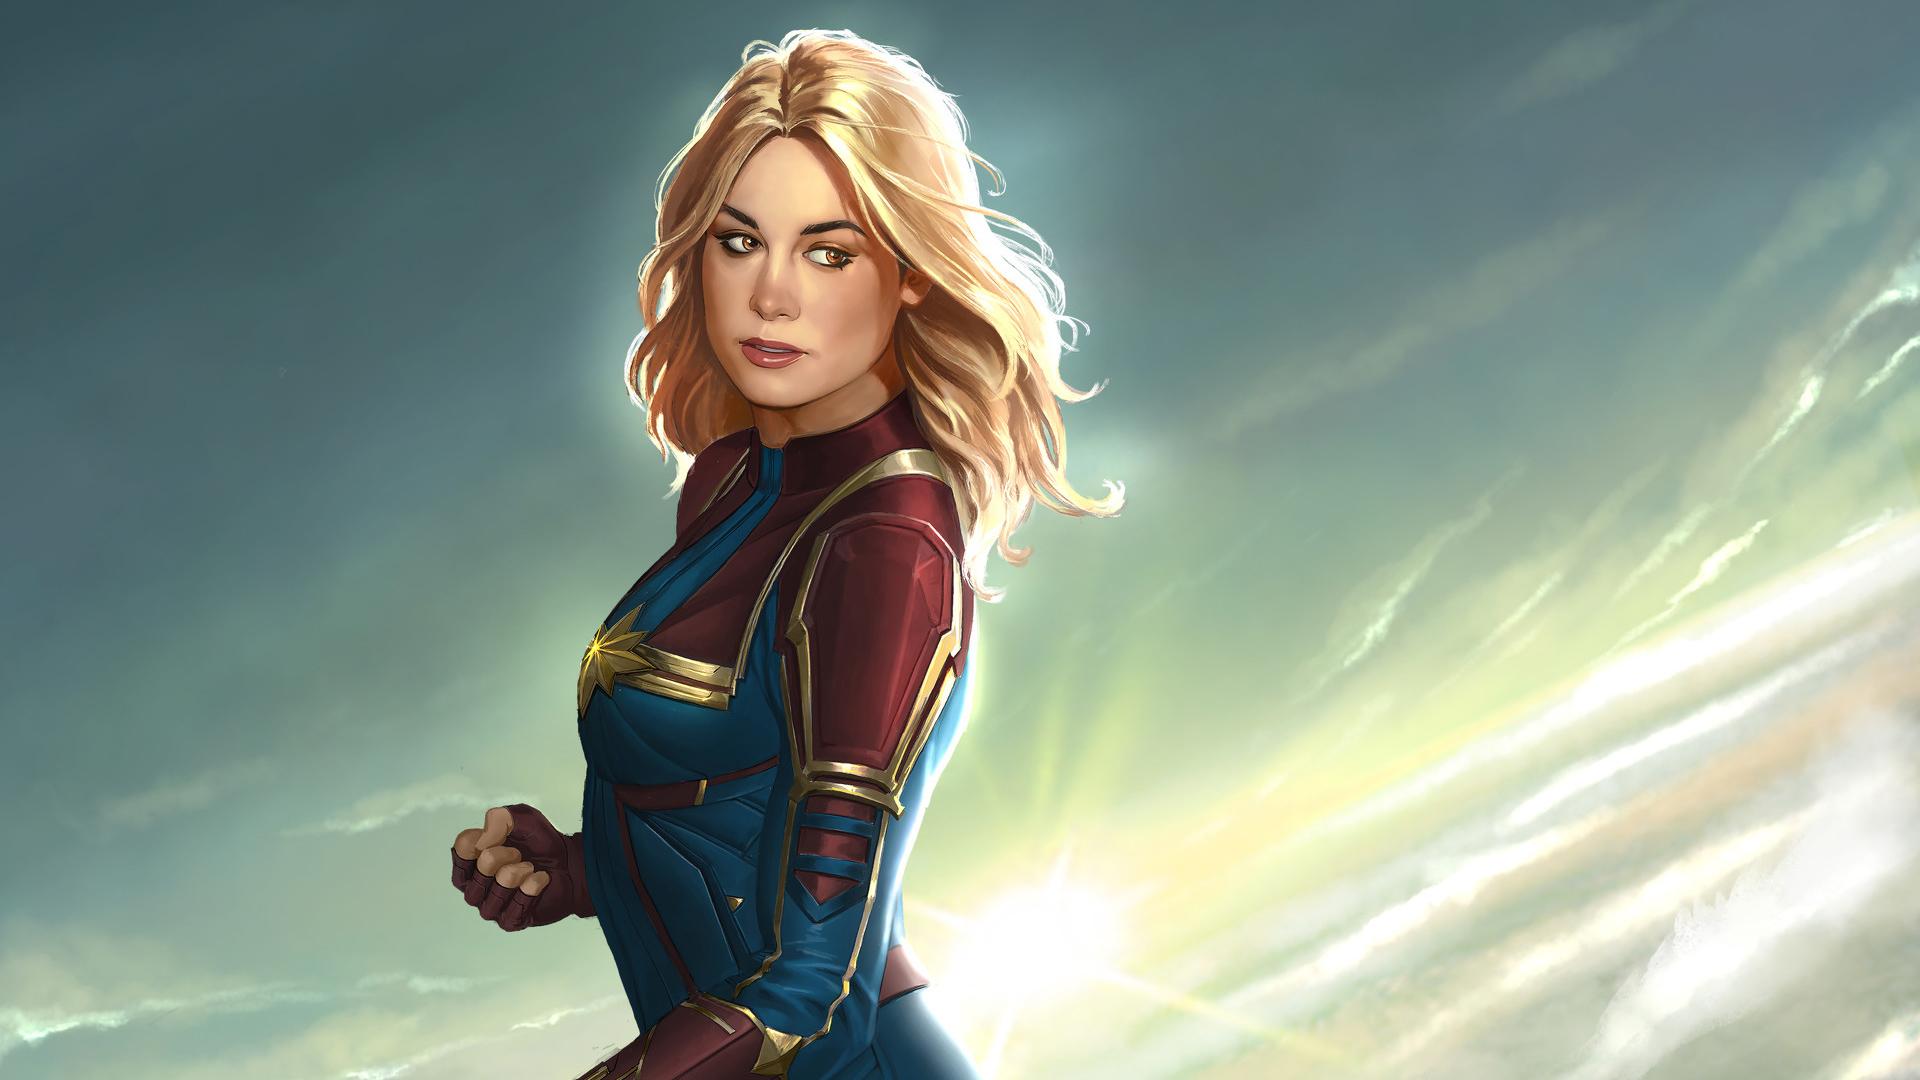 Captain Marvel Fantasy Art Wallpapers Hd Desktop And: Captain Marvel New Artworks, HD Superheroes, 4k Wallpapers